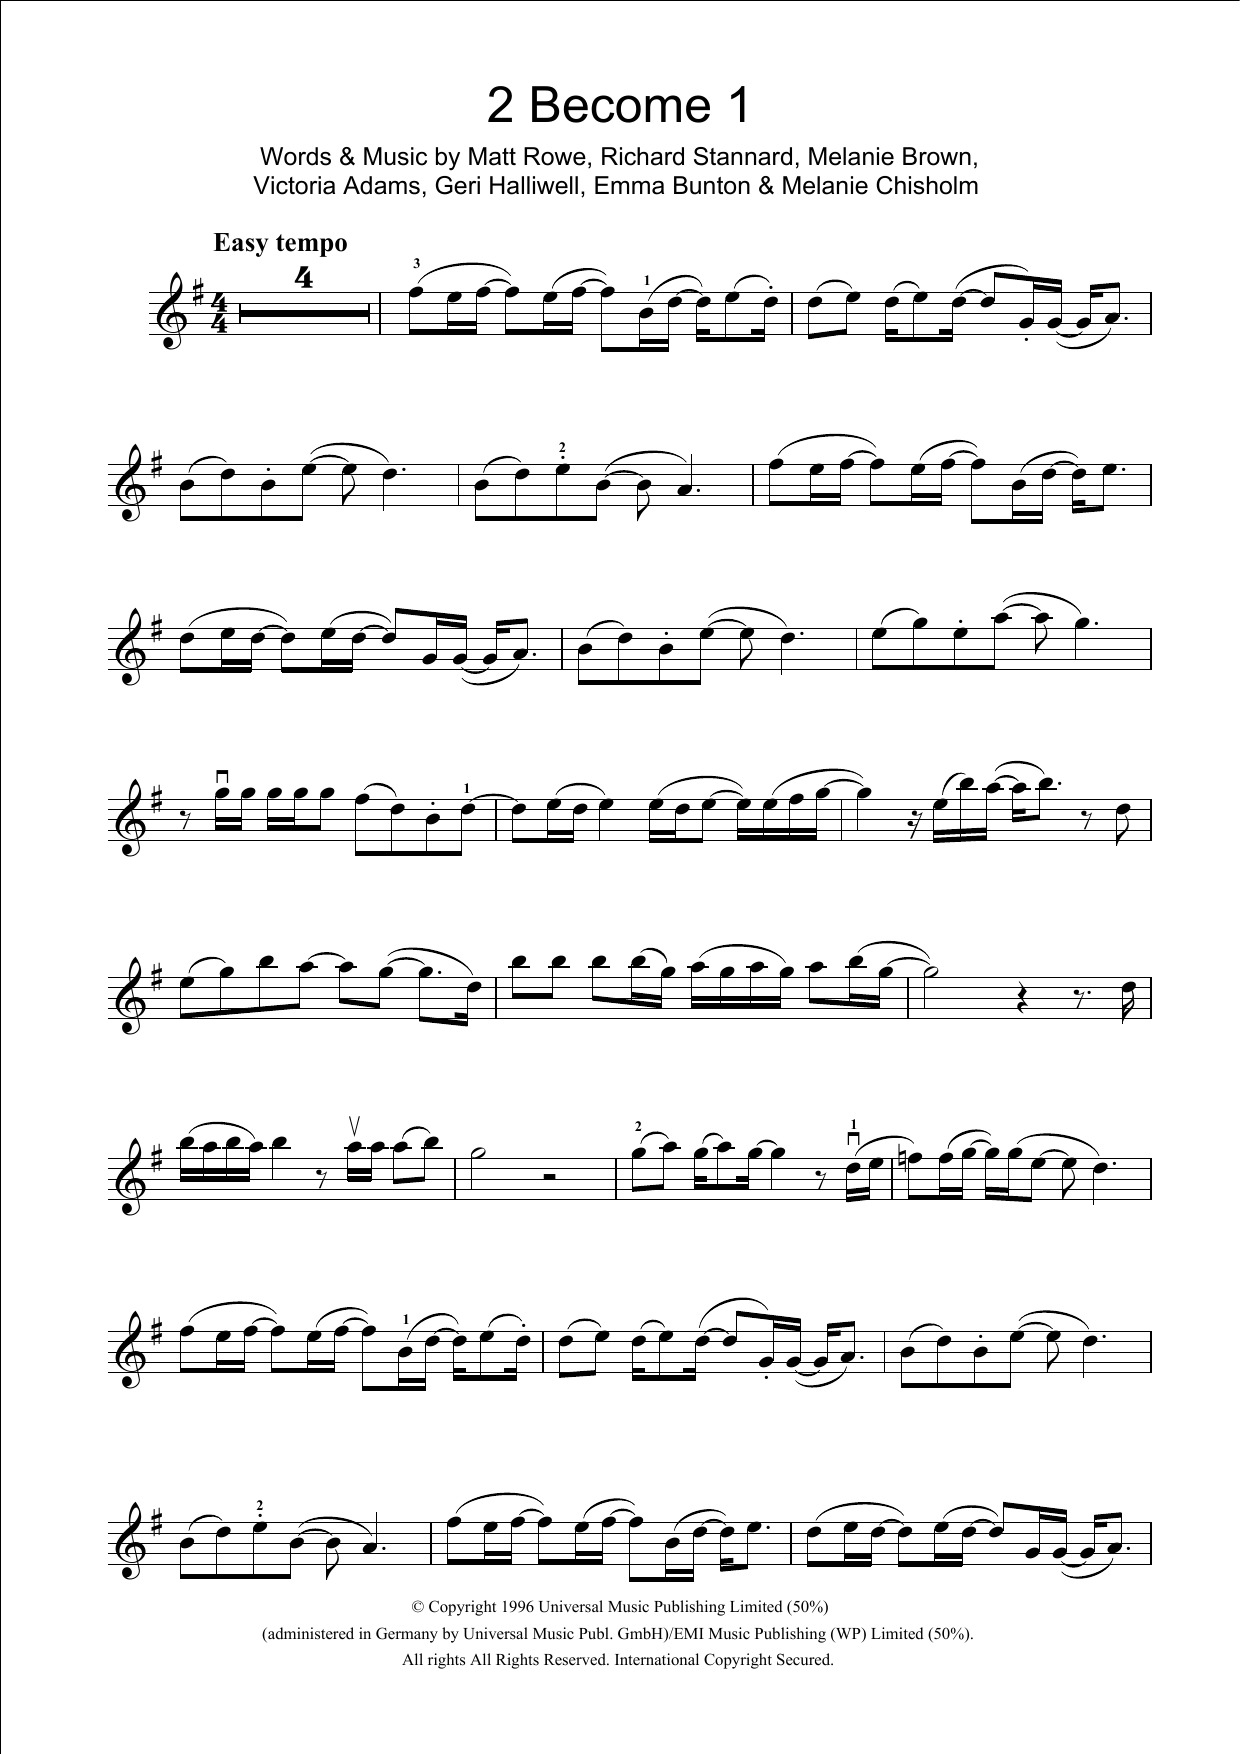 2 Become 1 Sheet Music